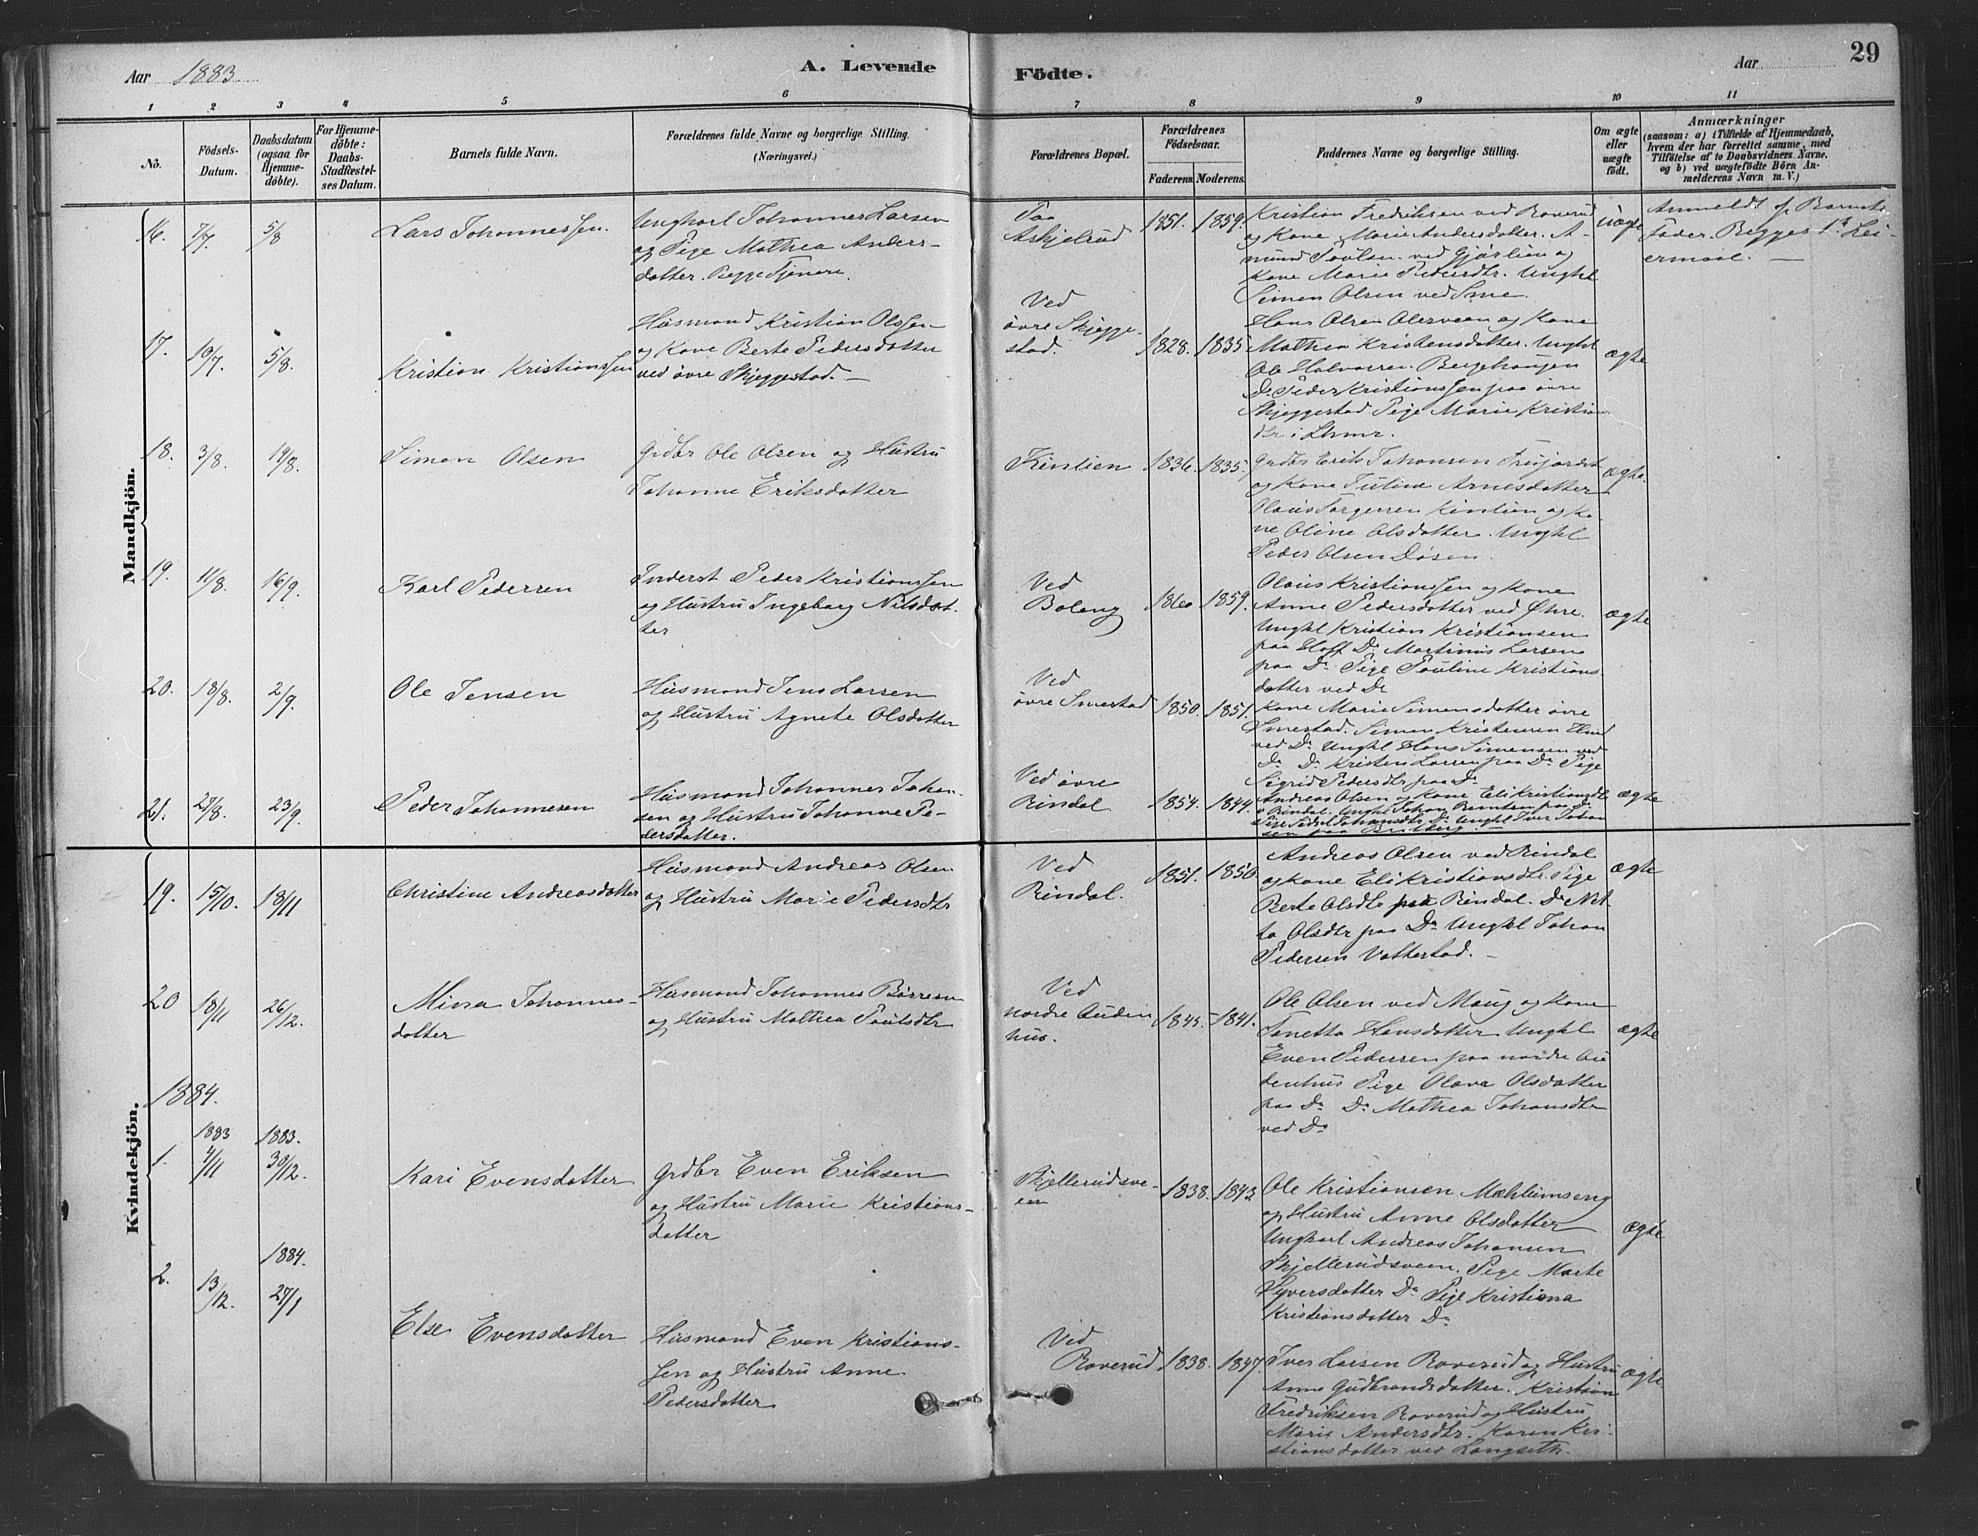 SAH, Fåberg prestekontor, Ministerialbok nr. 9, 1879-1898, s. 29